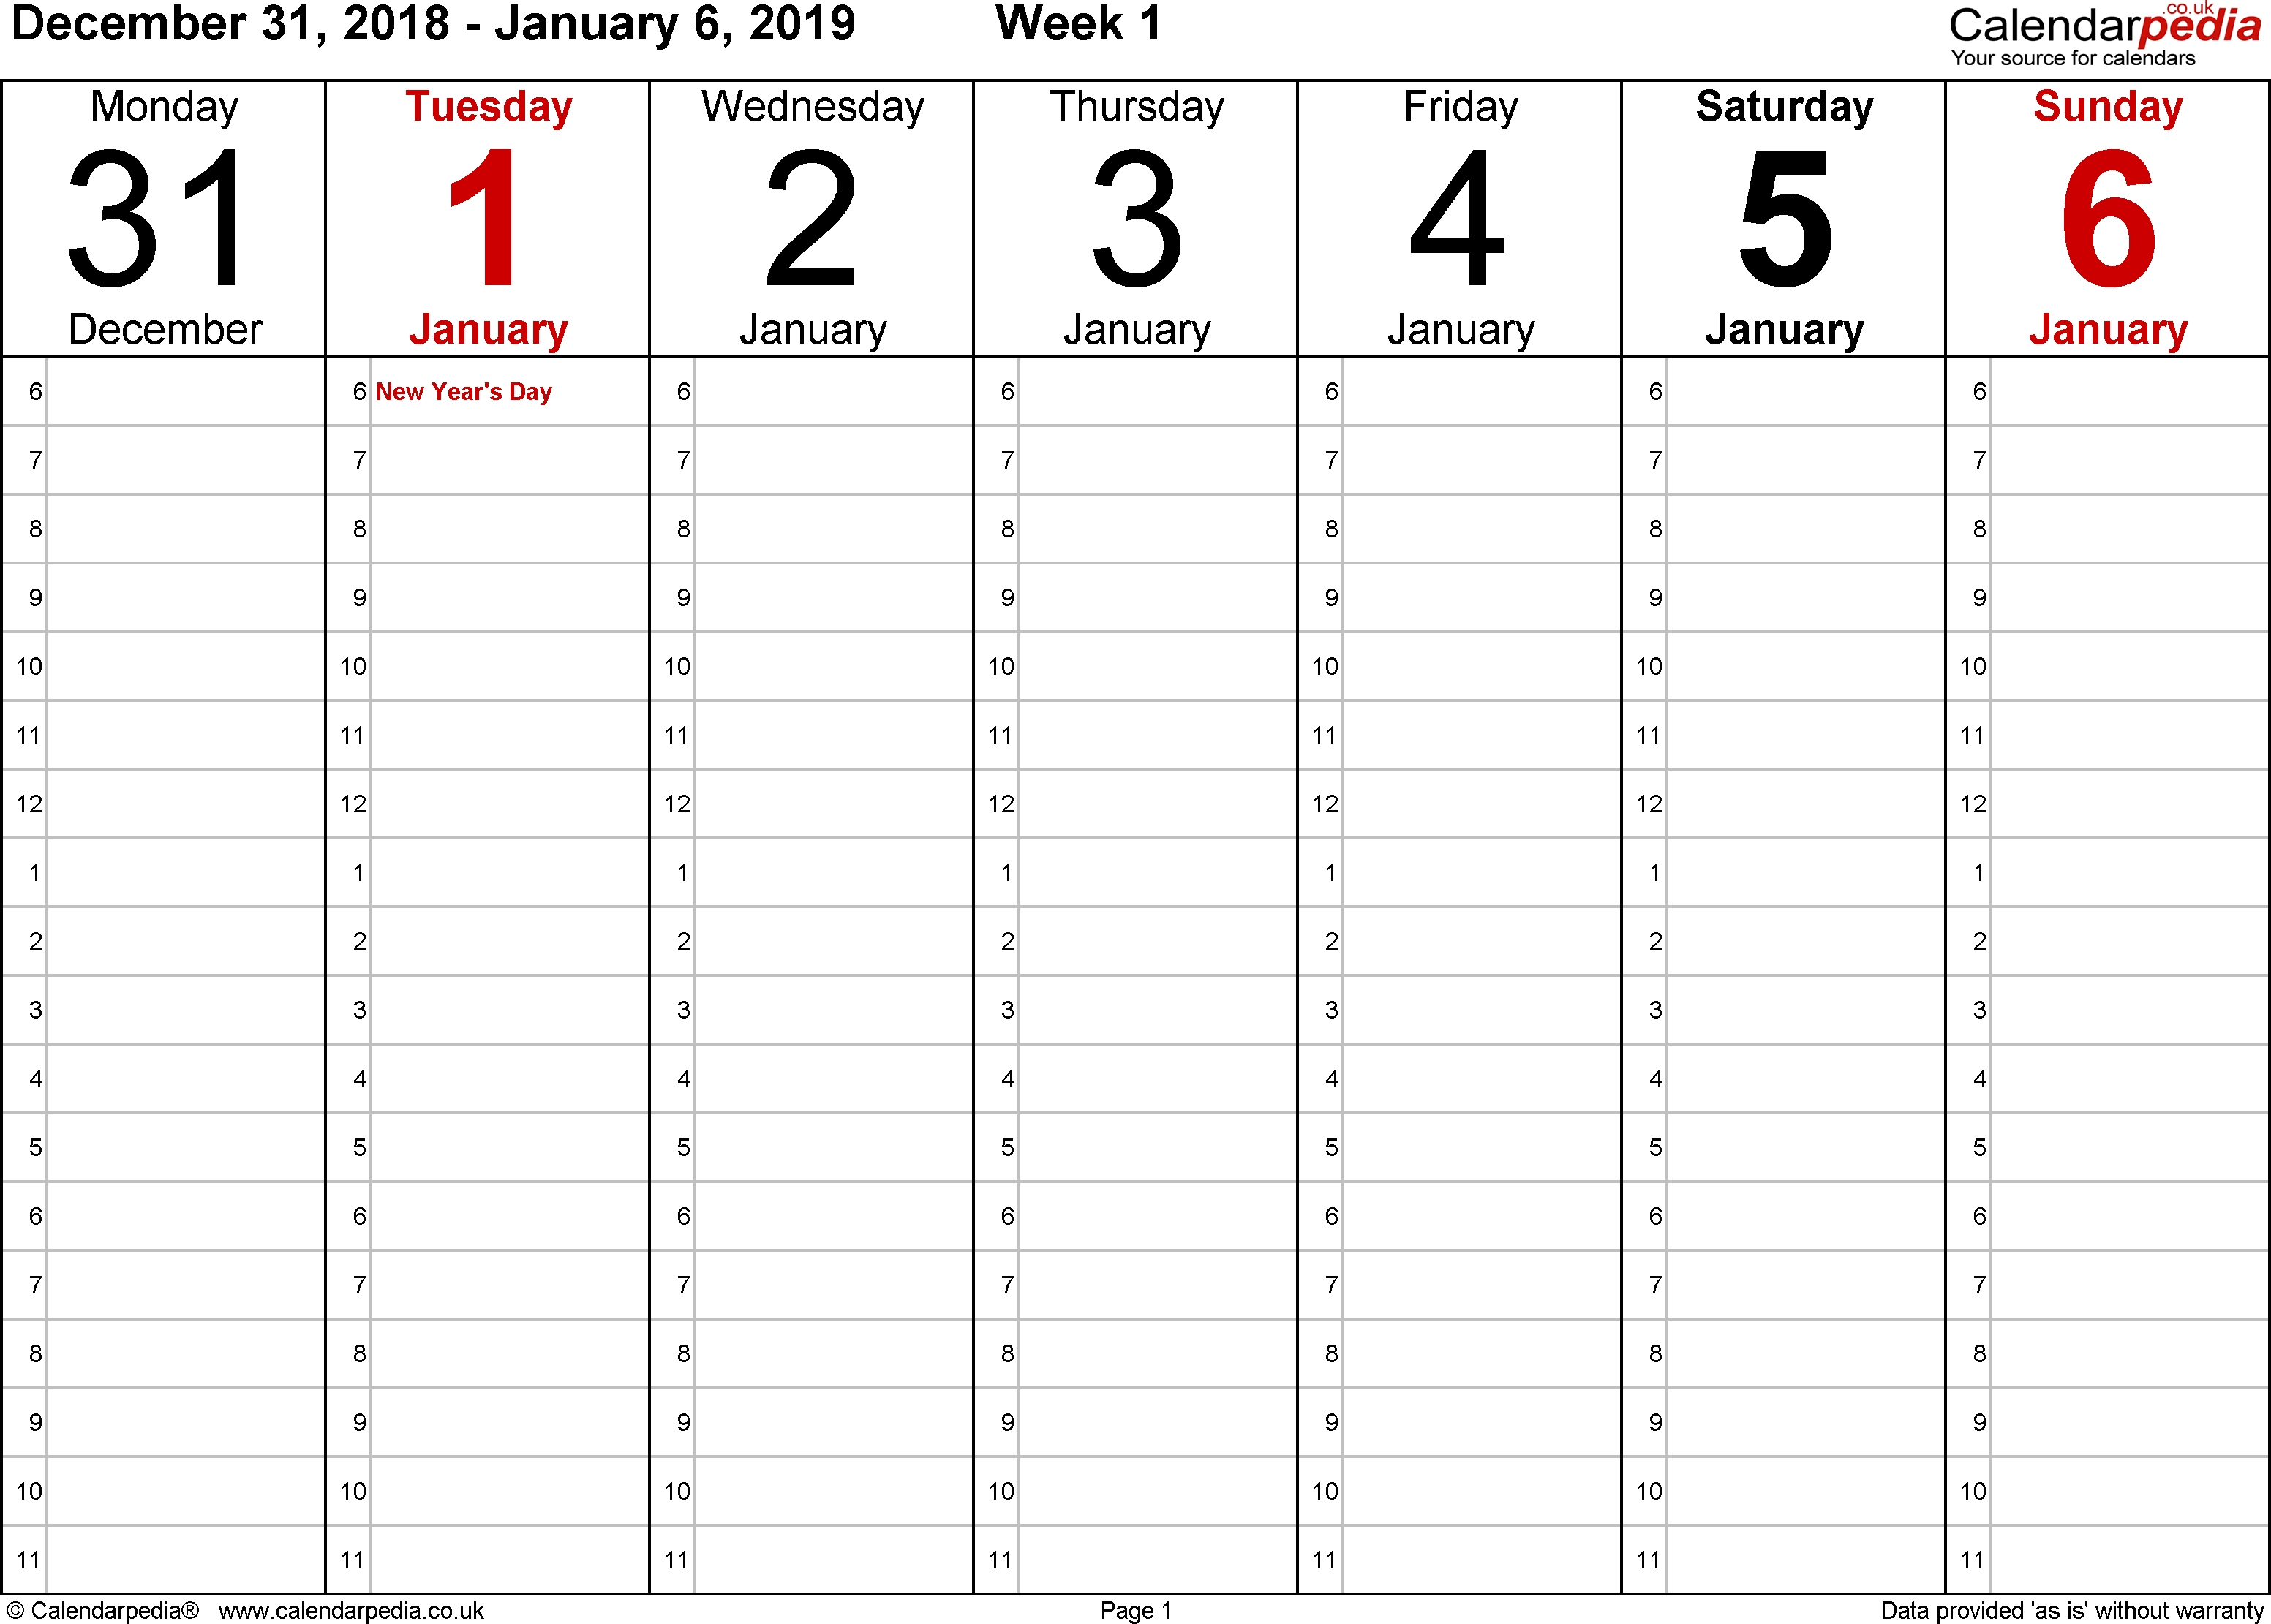 Weekly Calendar 2019 Uk - Free Printable Templates For Word